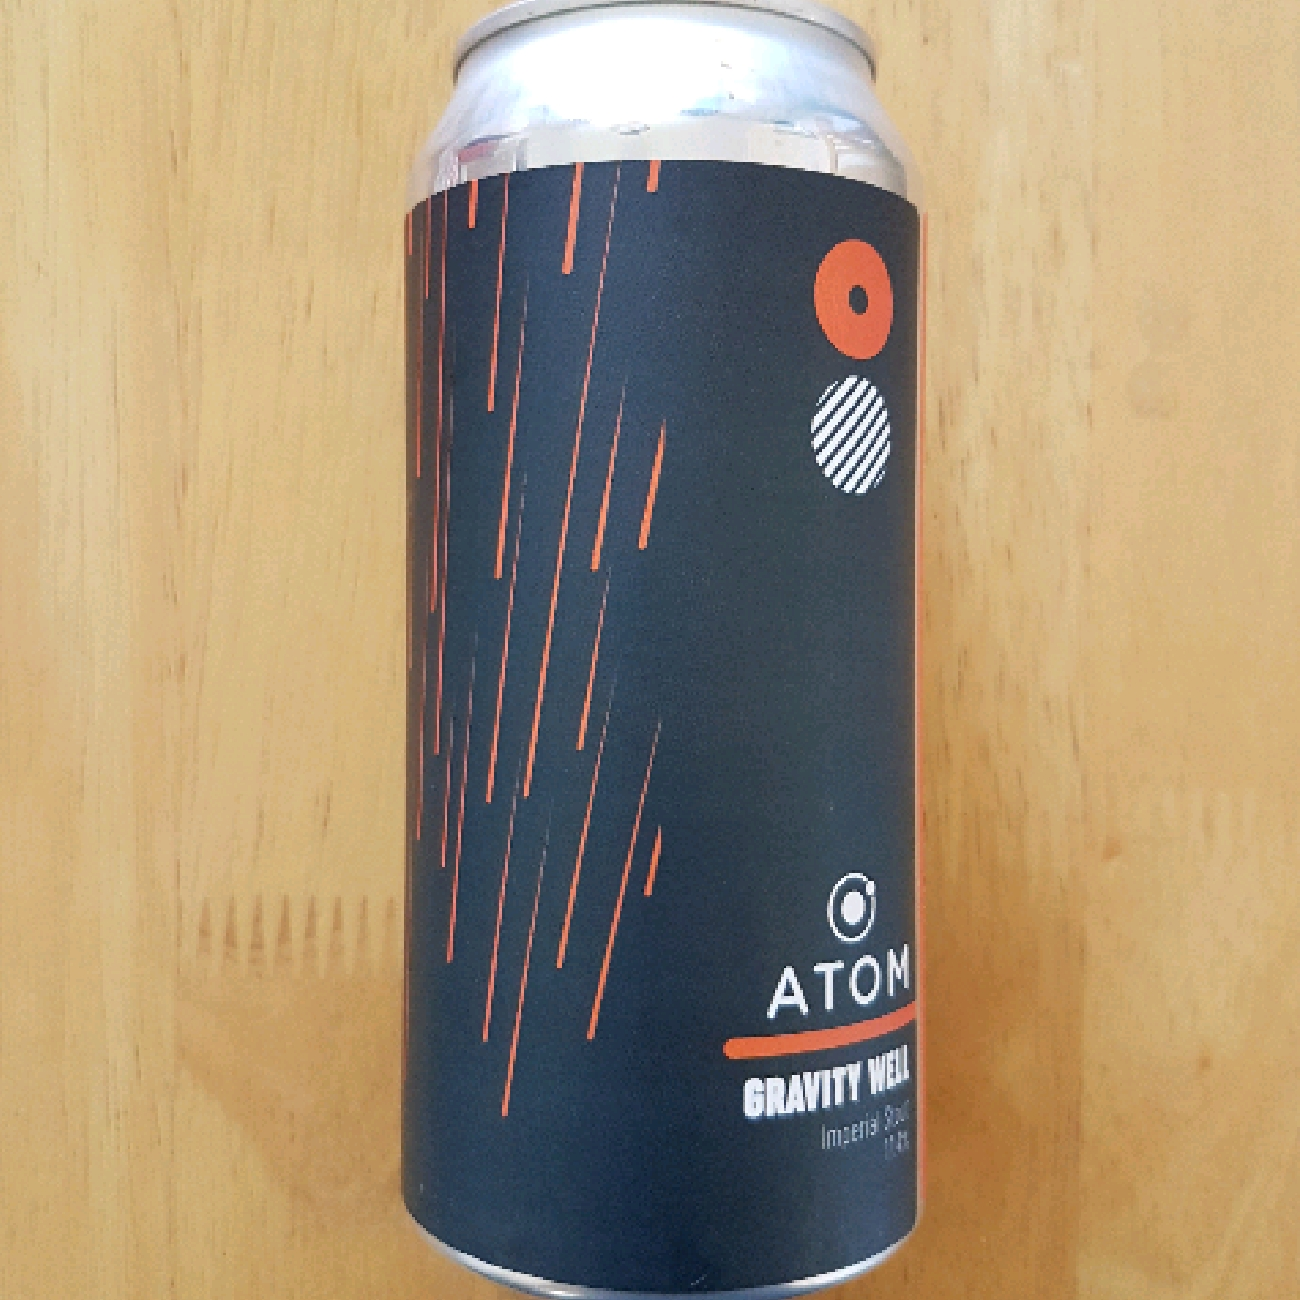 Atom Gravity Well